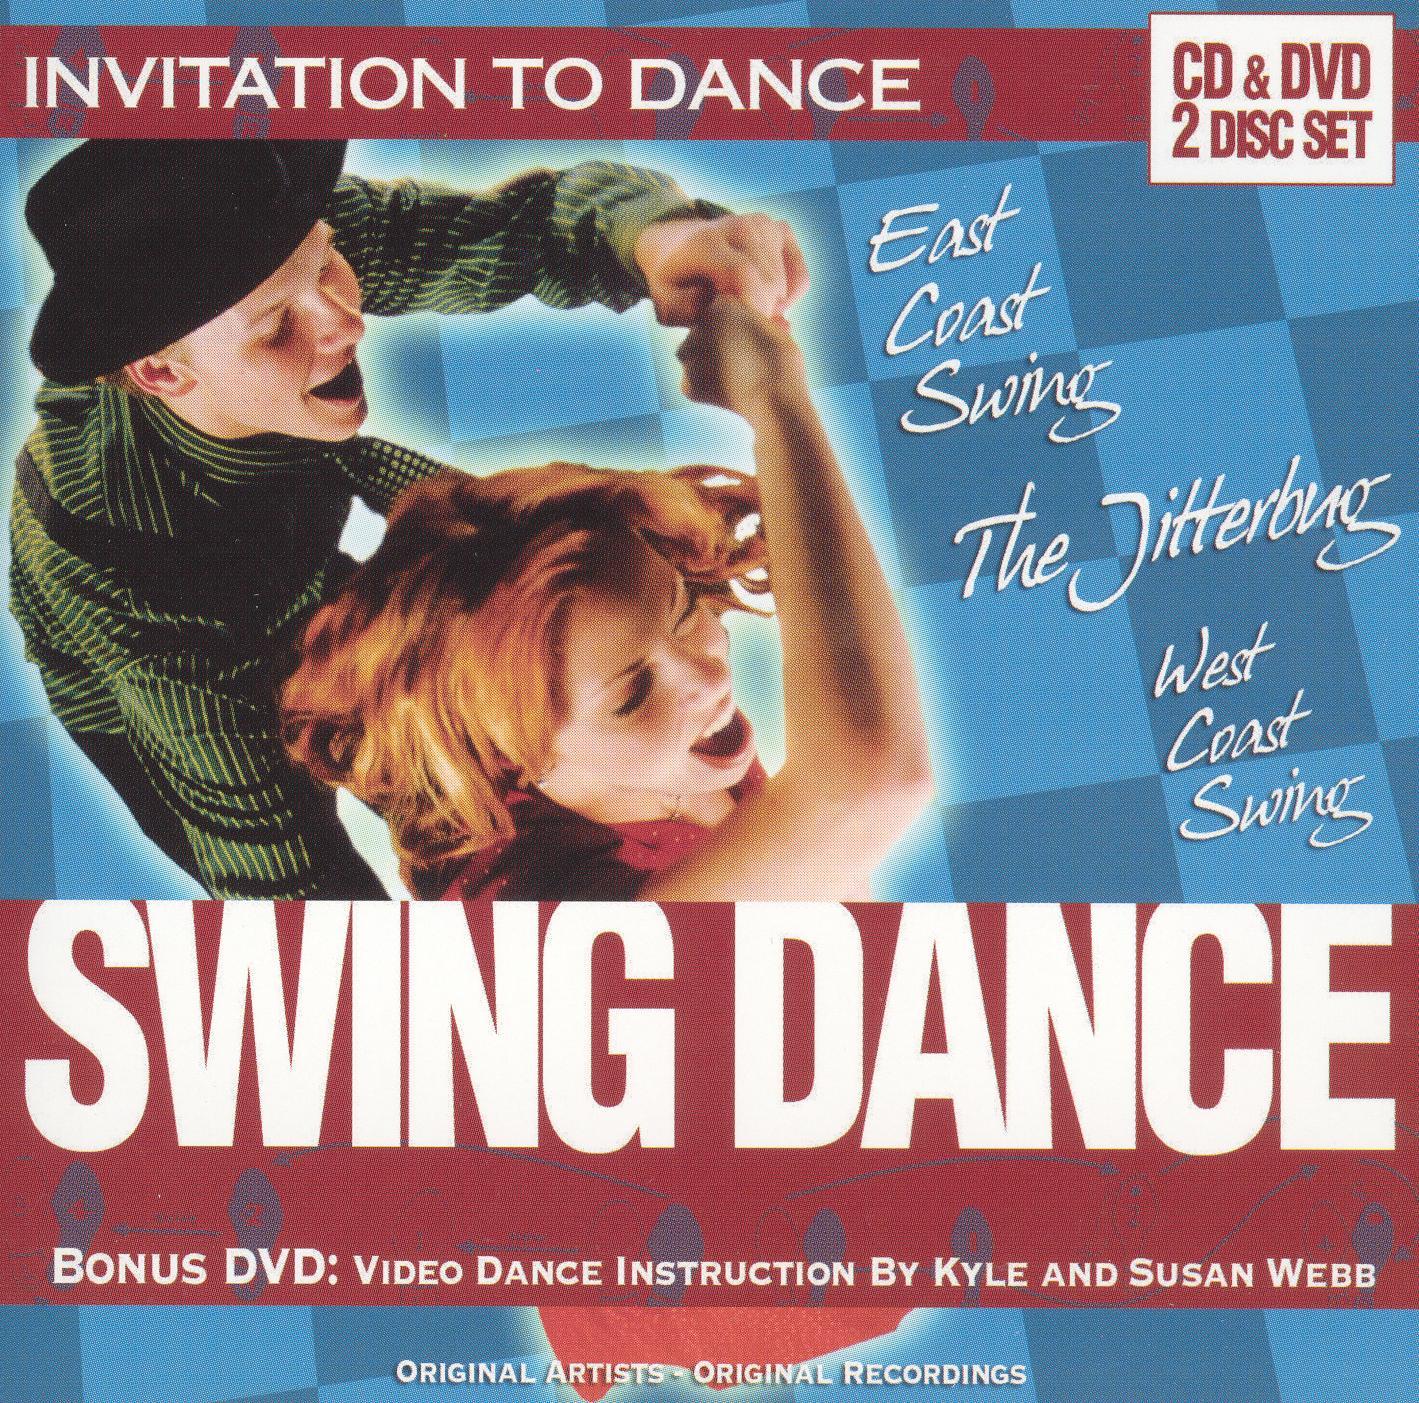 Invitation to Dance: Swing Dance!